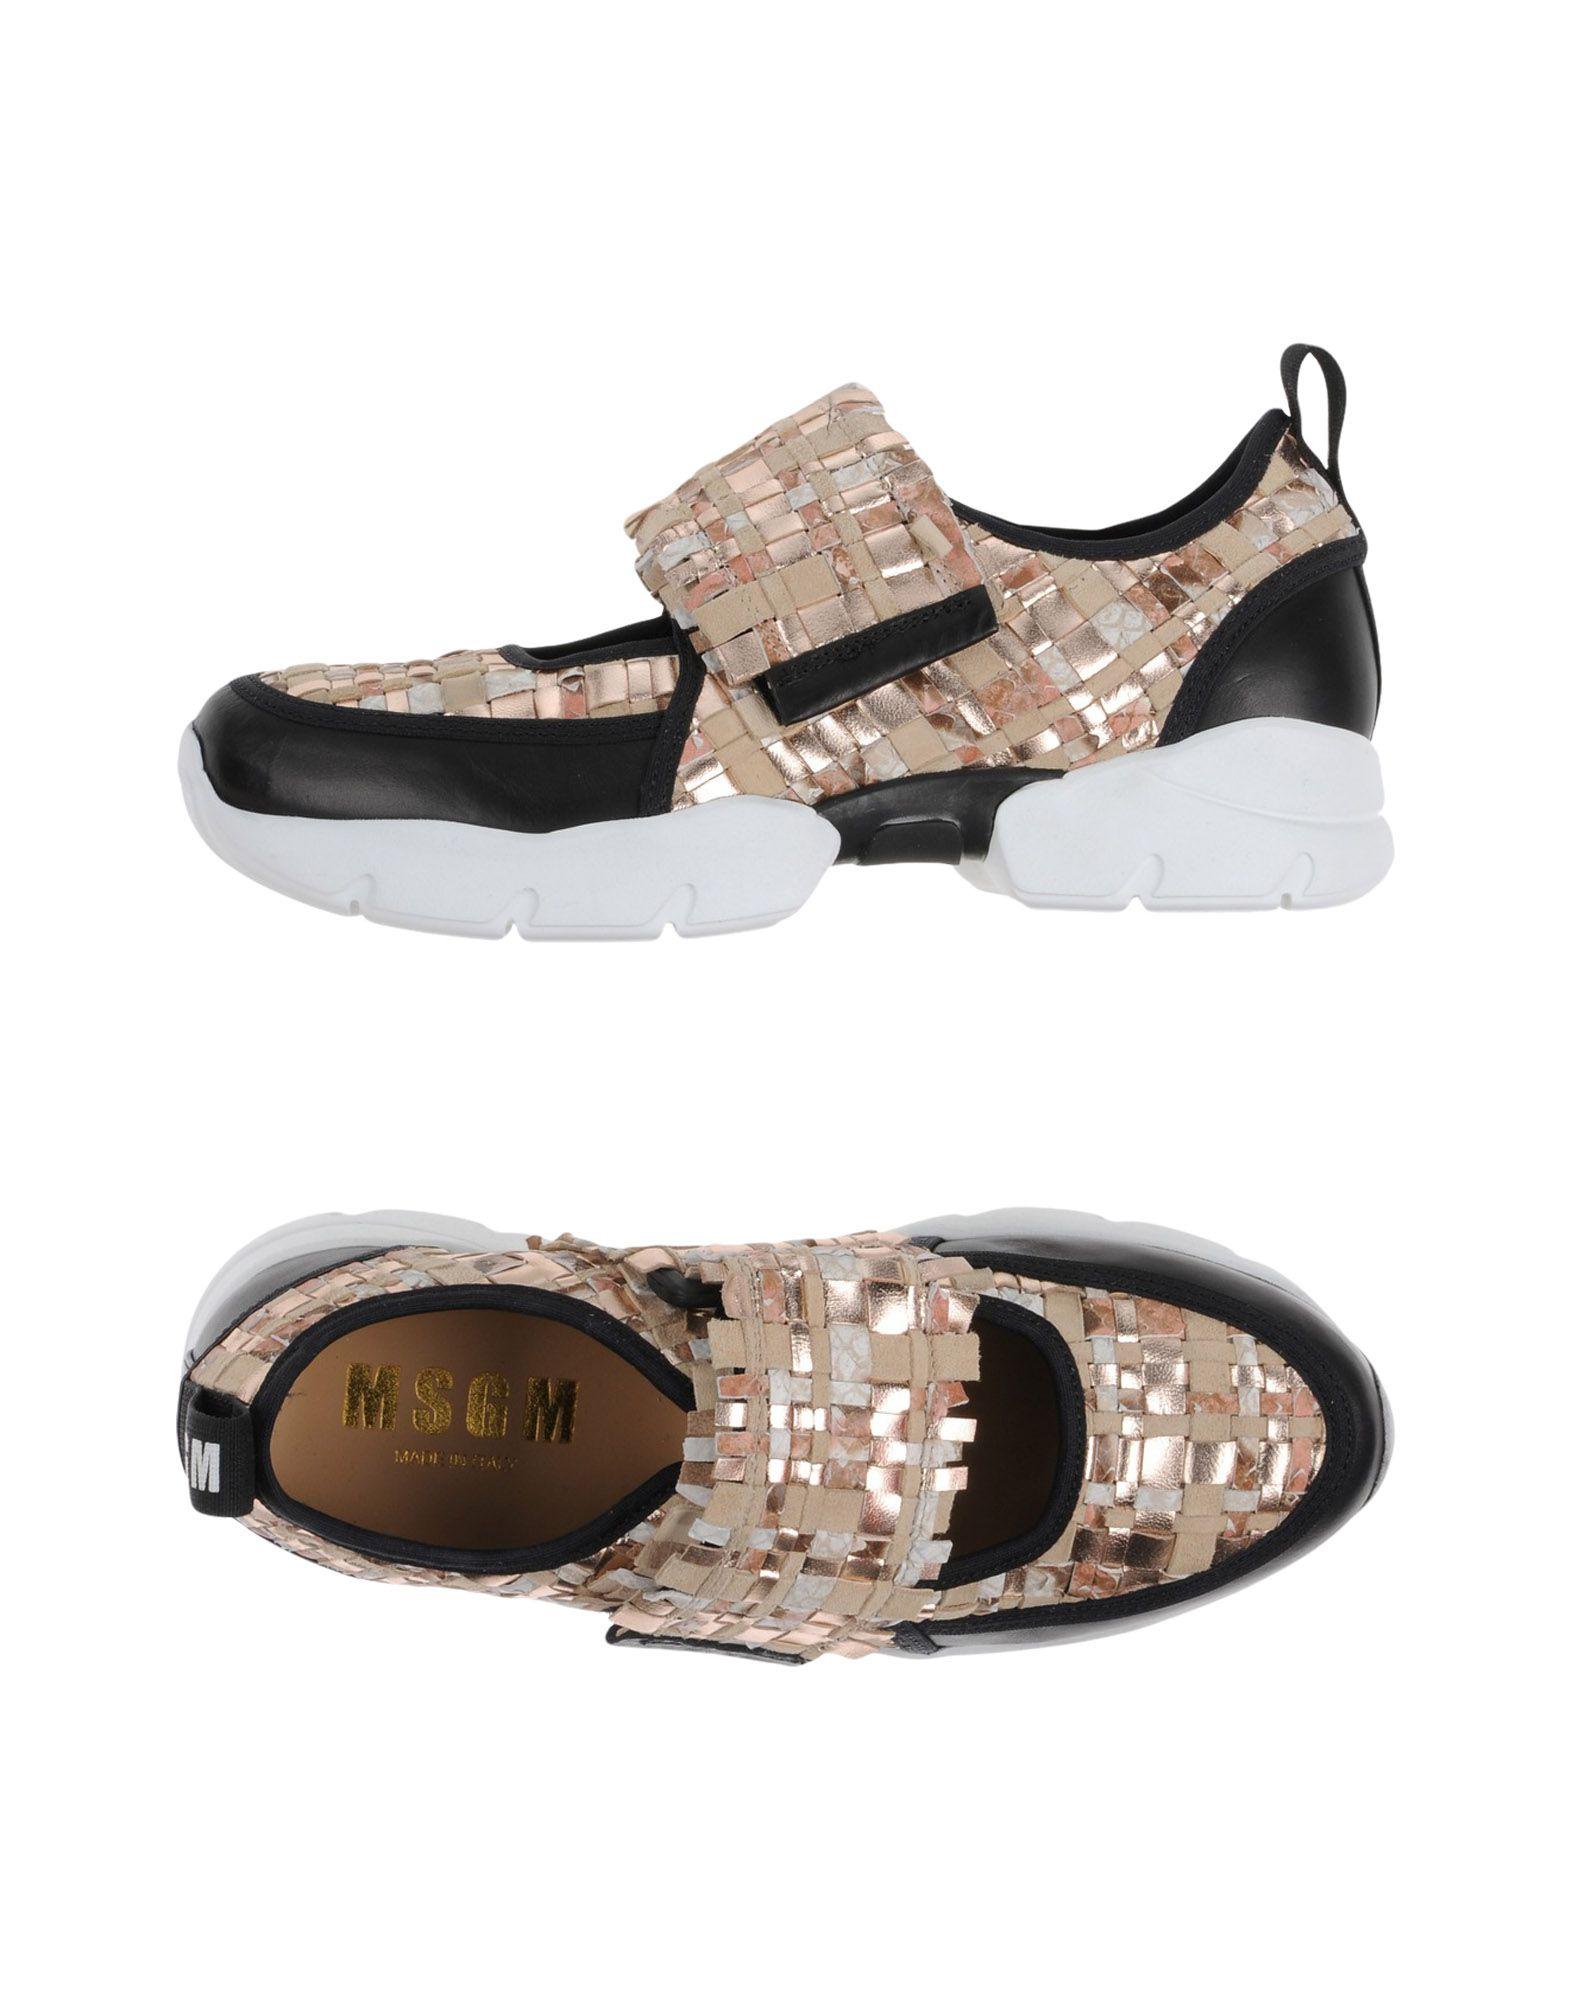 Msgm Sneakers - Women Women Women Msgm Sneakers online on  United Kingdom - 11250478MK 48248b